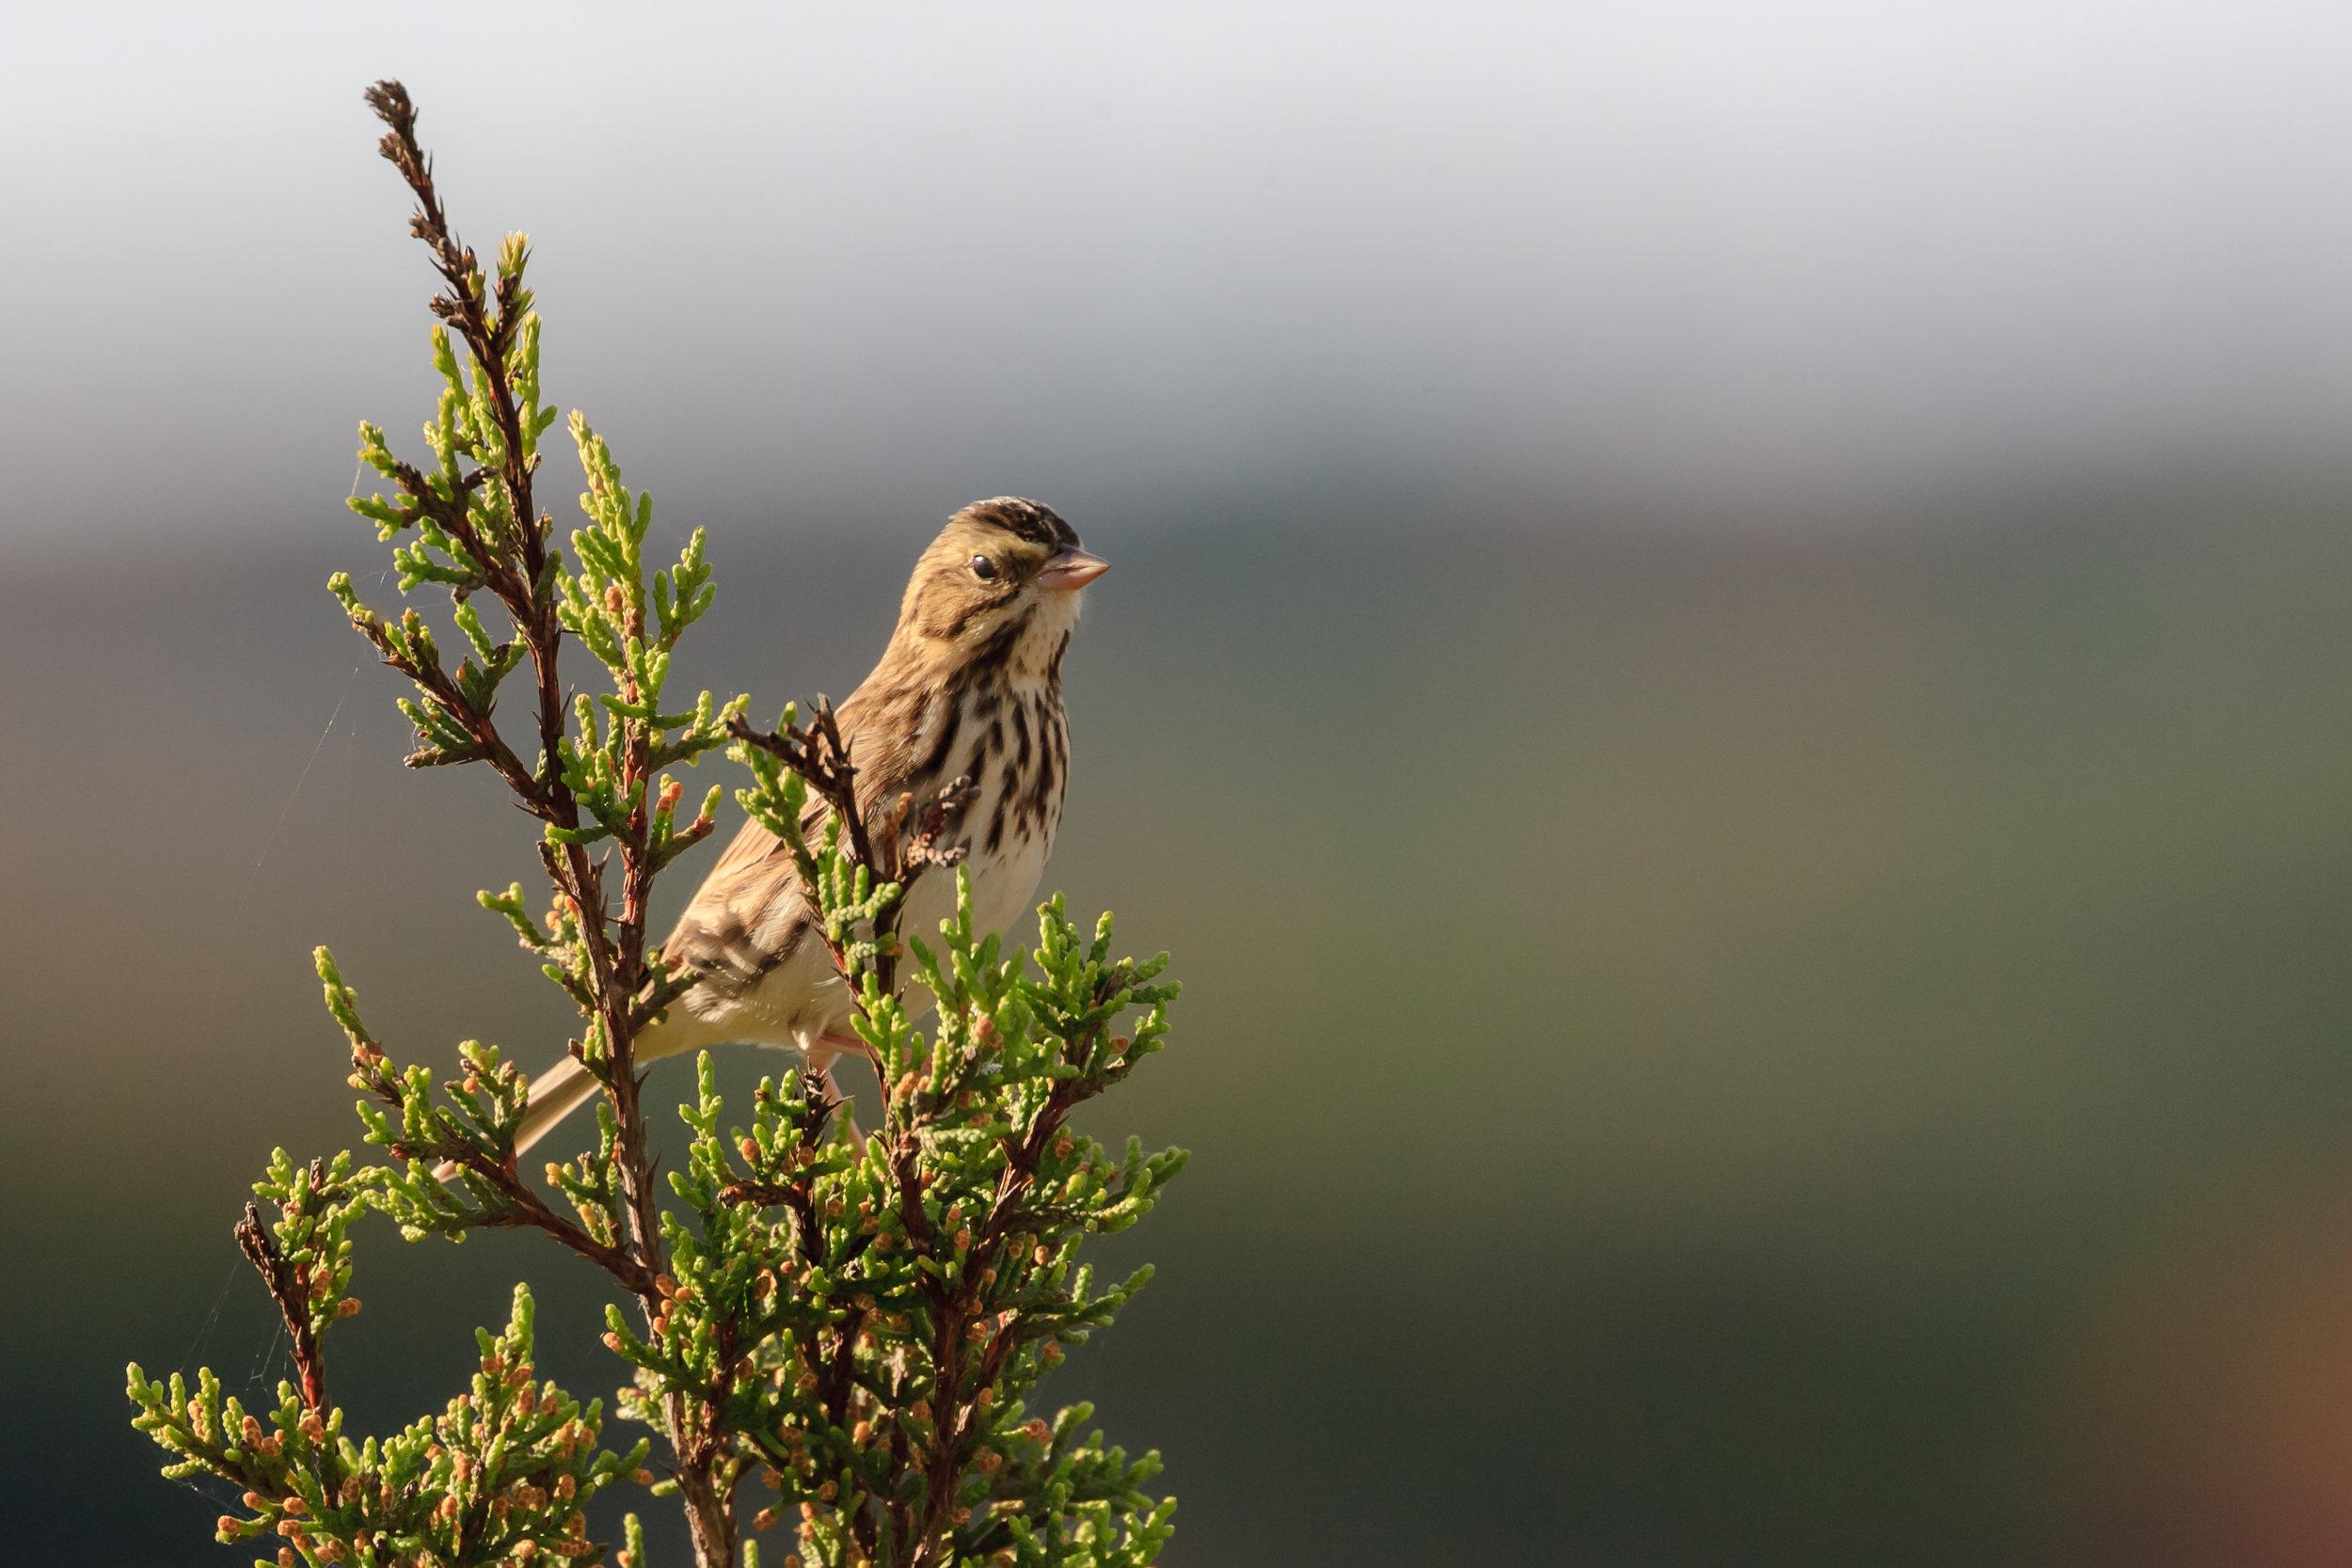 Species: Savannah Sparrow Photo Credit: Damian Martinez Date: November 2018 Location: Joshua Springs Park and Preserve